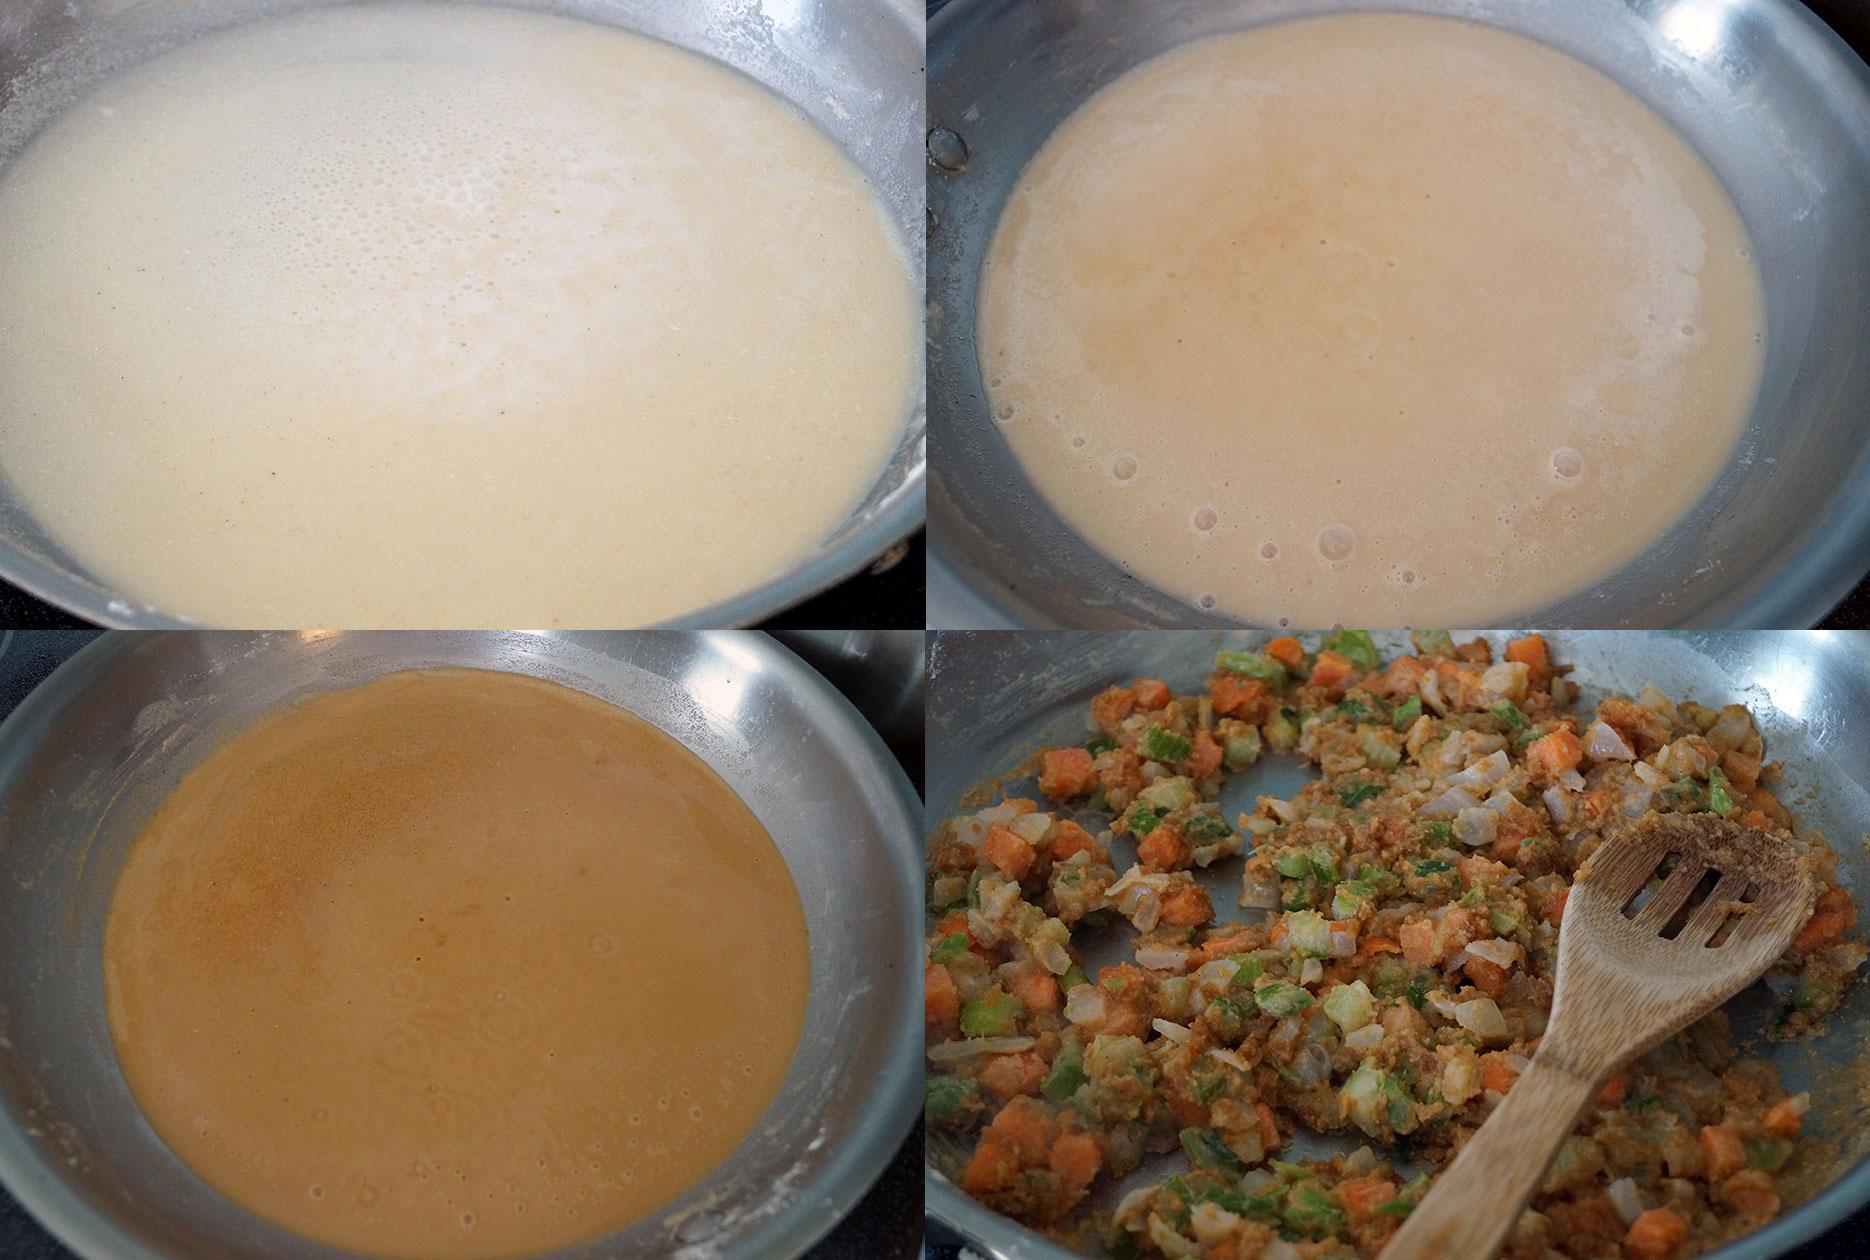 cassava flour roux paleo aip gluten-free